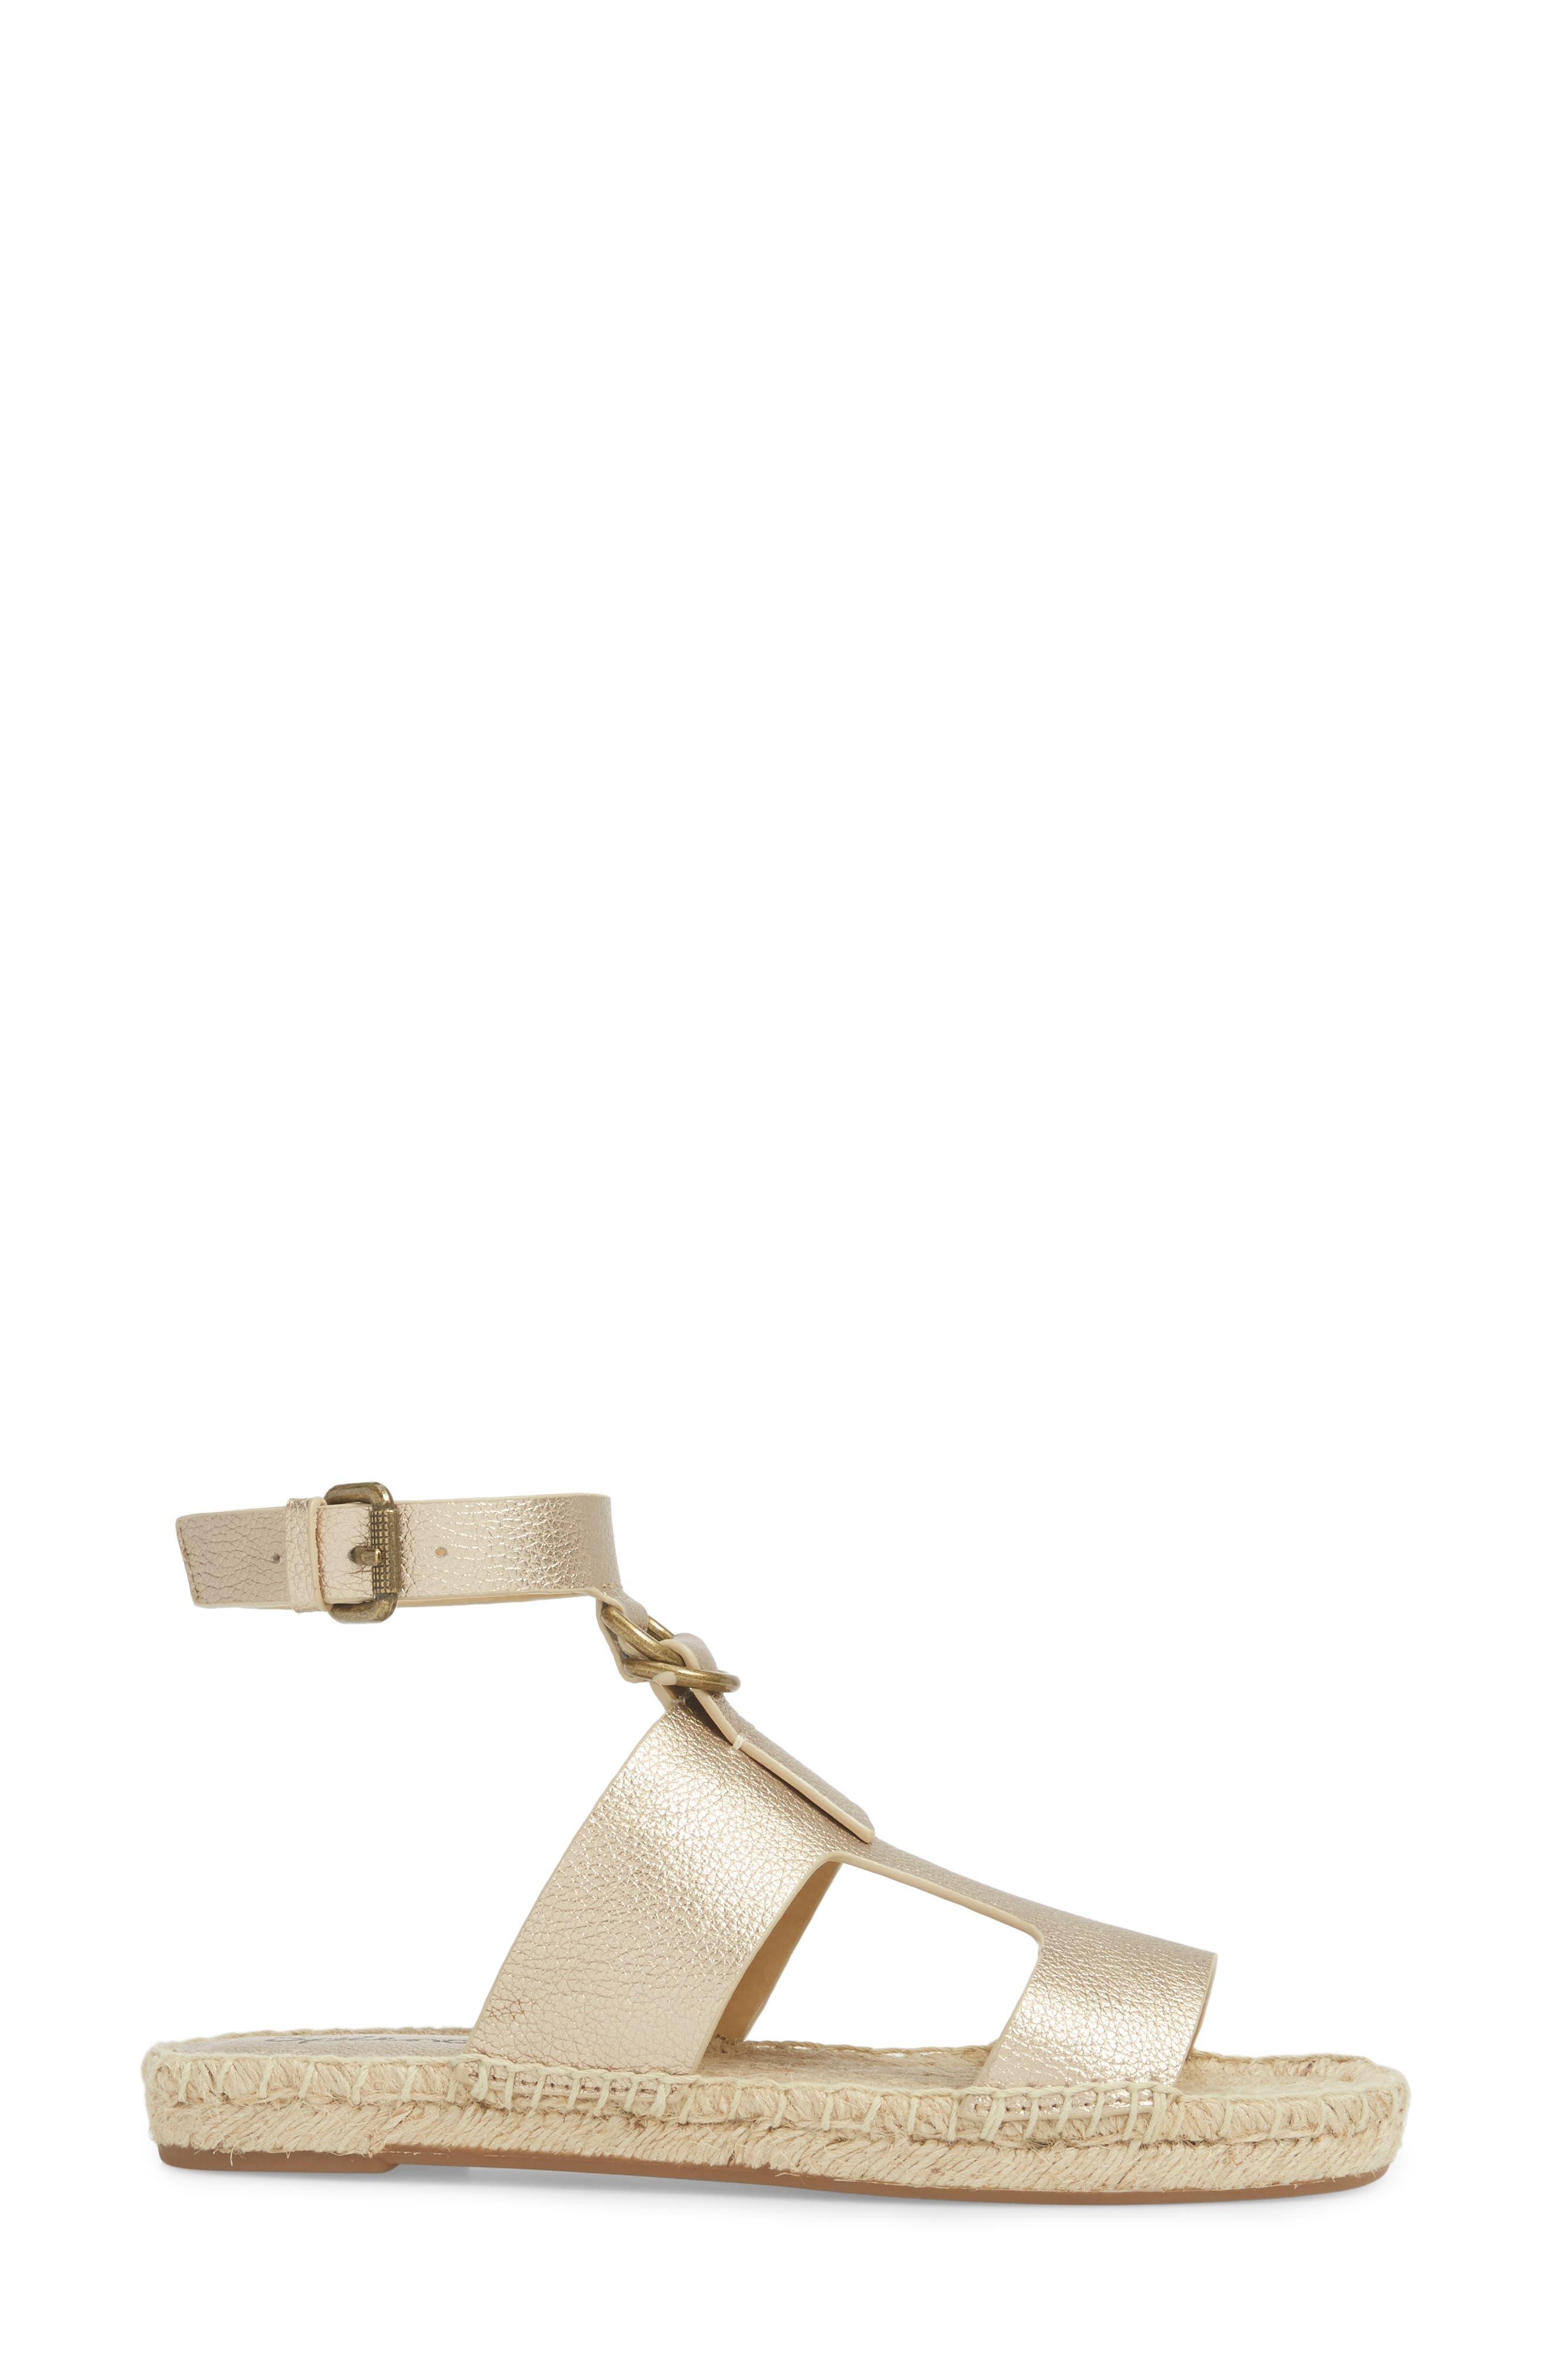 Farley Espadrille Sandal,                             Alternate thumbnail 3, color,                             Champagne Leather